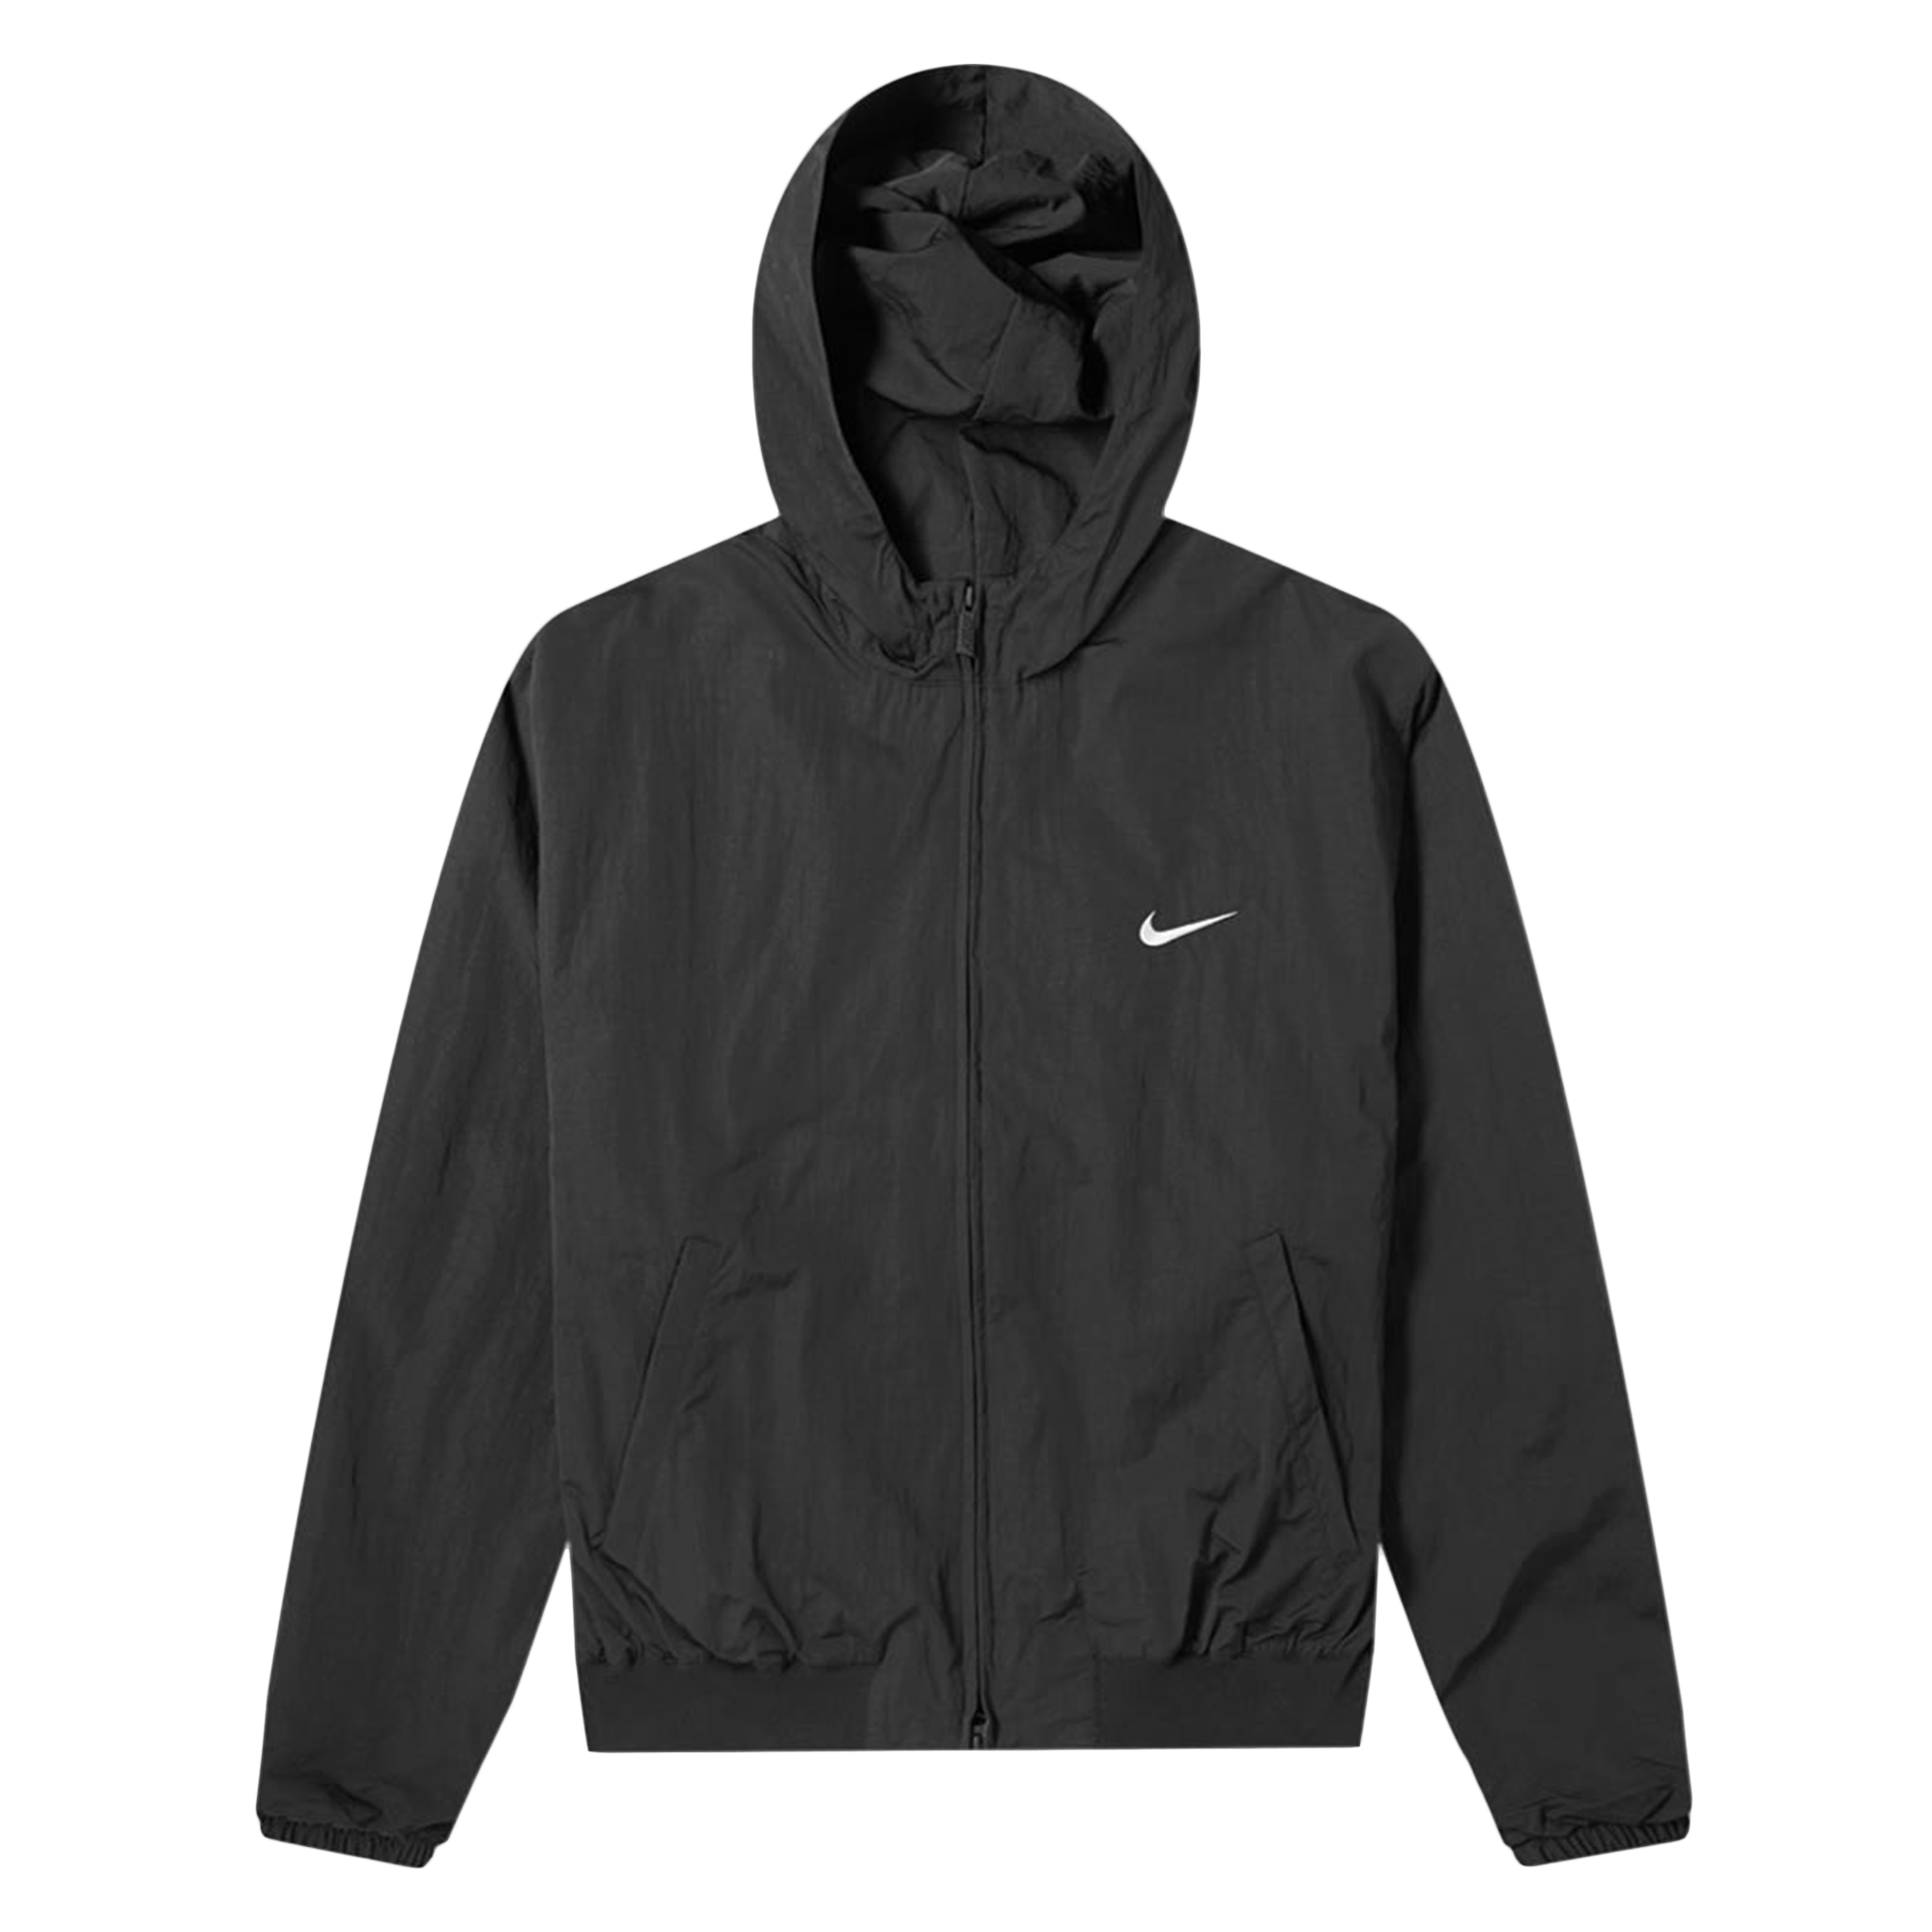 Nike x Fear Of God Bomber Jacket black / sail / black